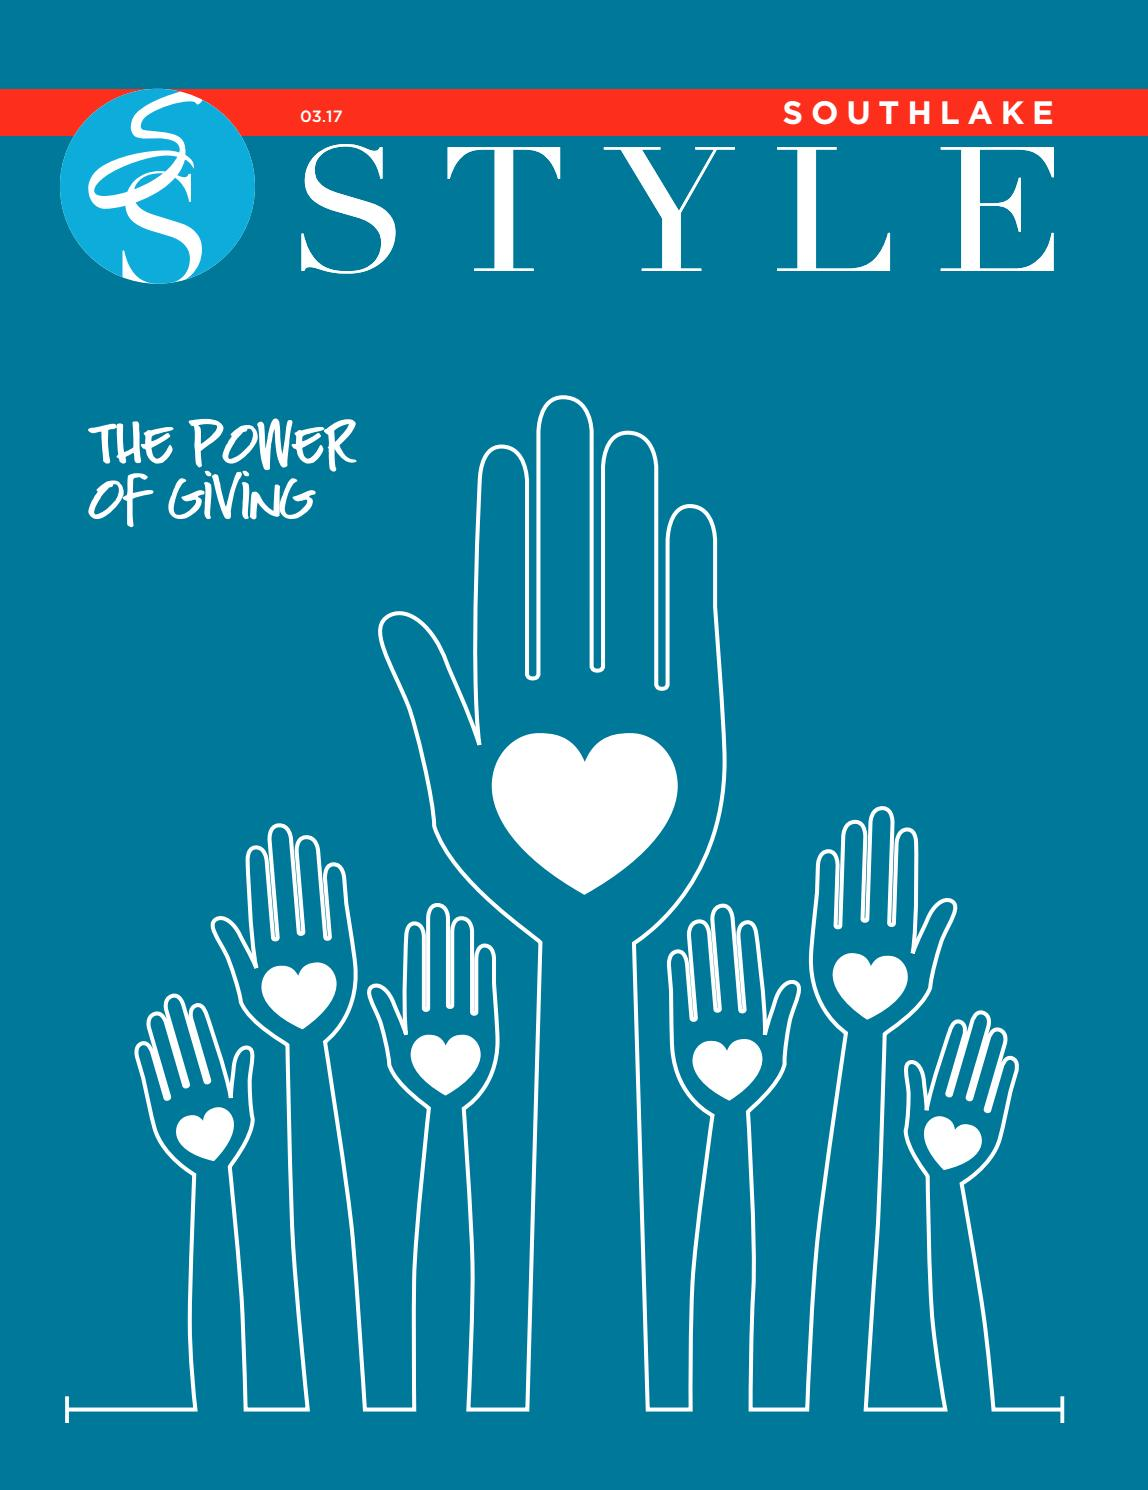 Southlake Style March 2017 by Southlake Style Magazine - issuu